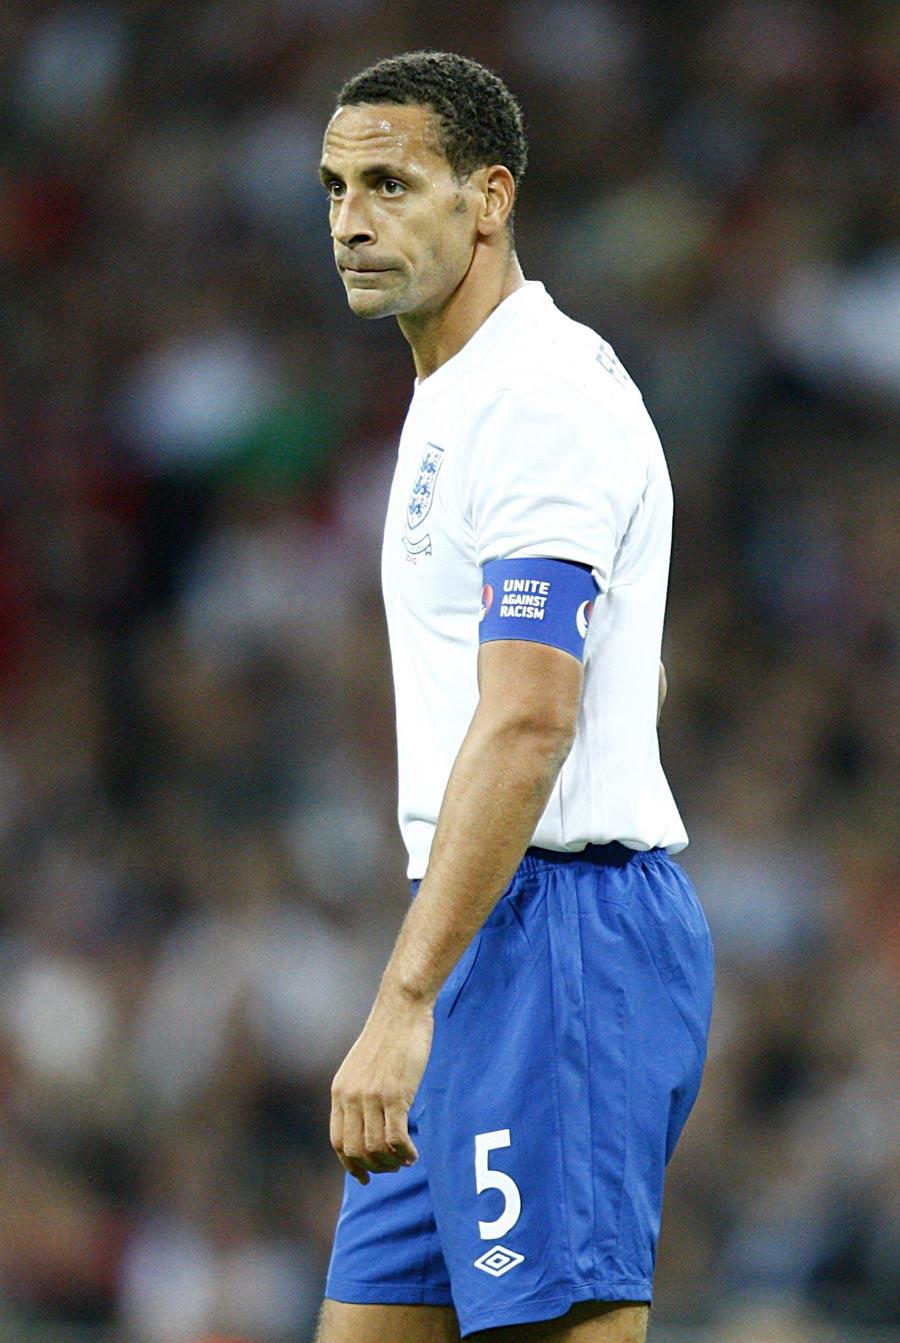 14978 - Ferdinand confirmed as vice-captain